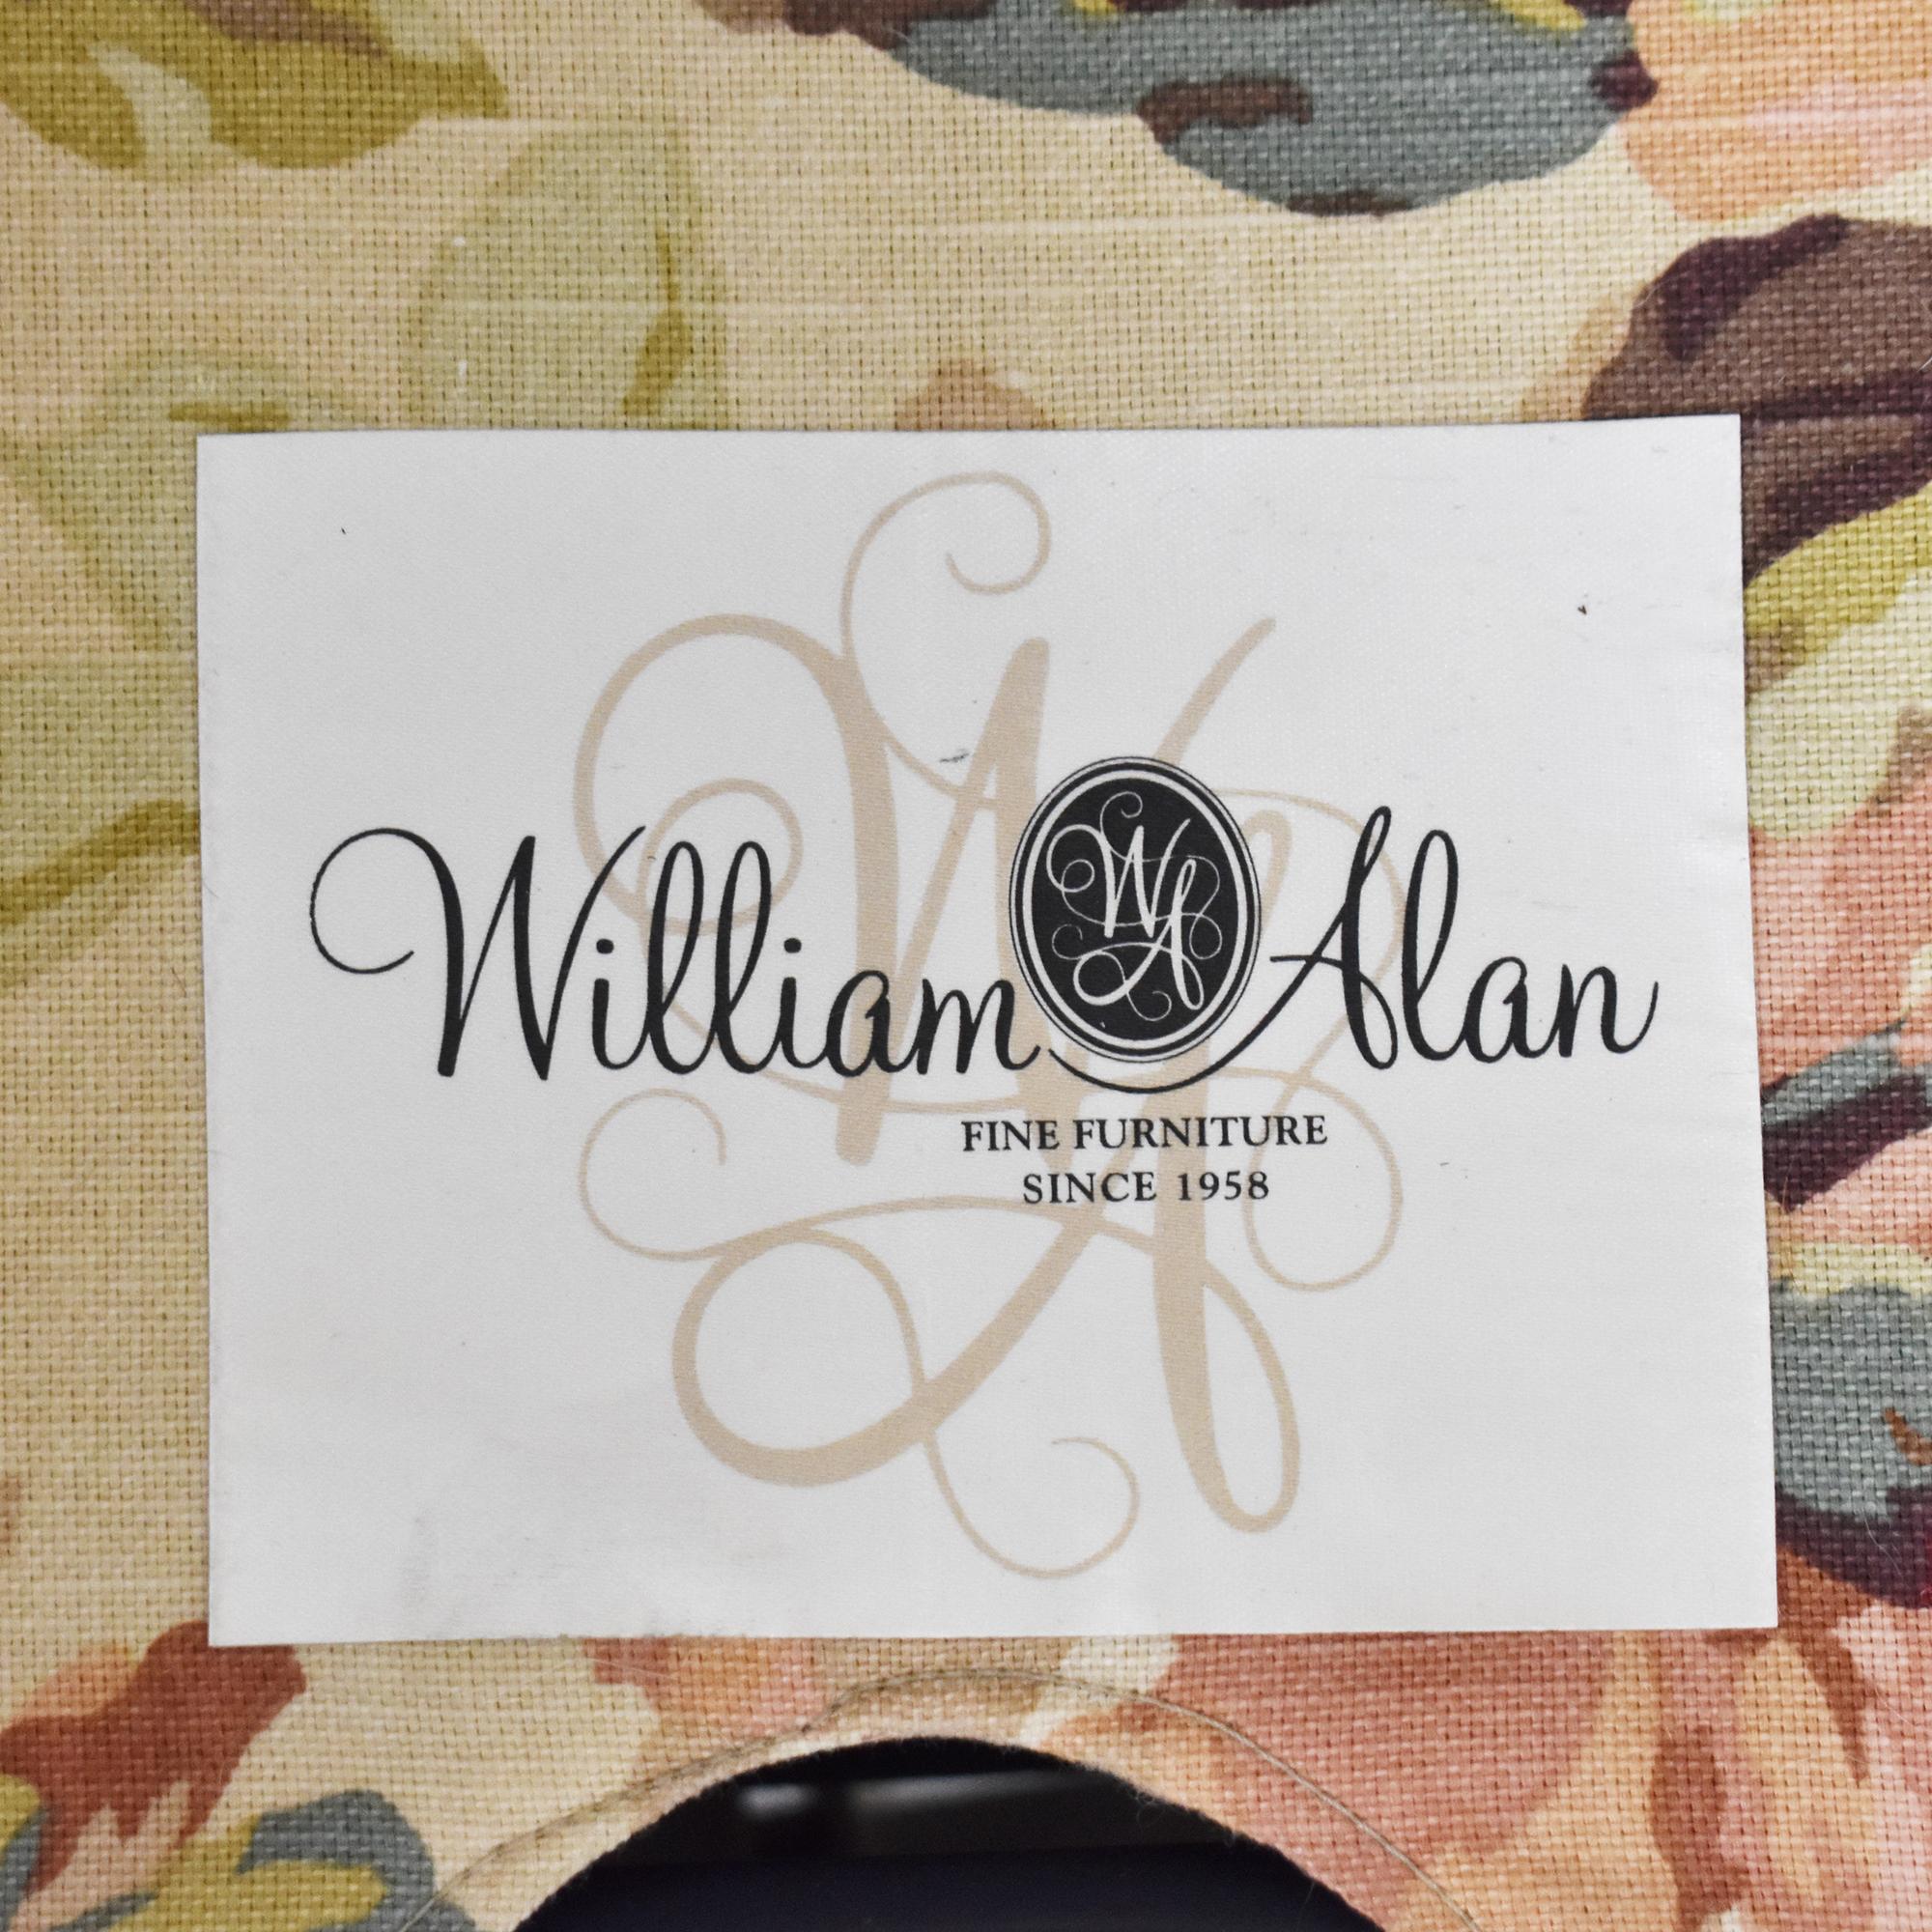 William Alan William Alan Loveseat Sleeper Sofa nyc